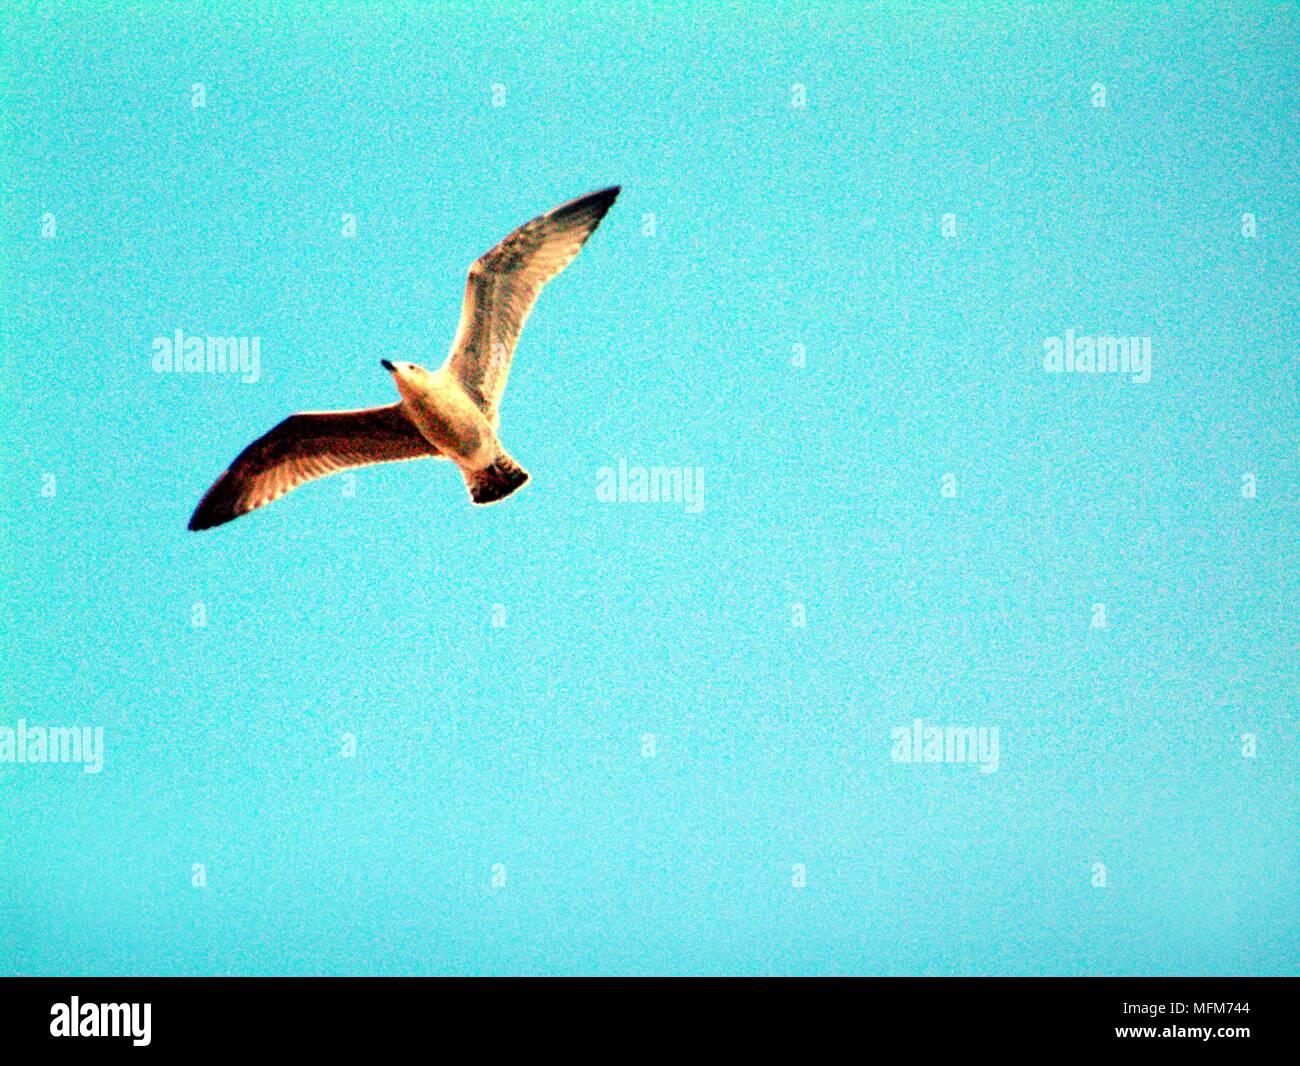 Lonely Brooding Vigil Of Solitary Heron >> Loner Bird Stock Photos Loner Bird Stock Images Alamy